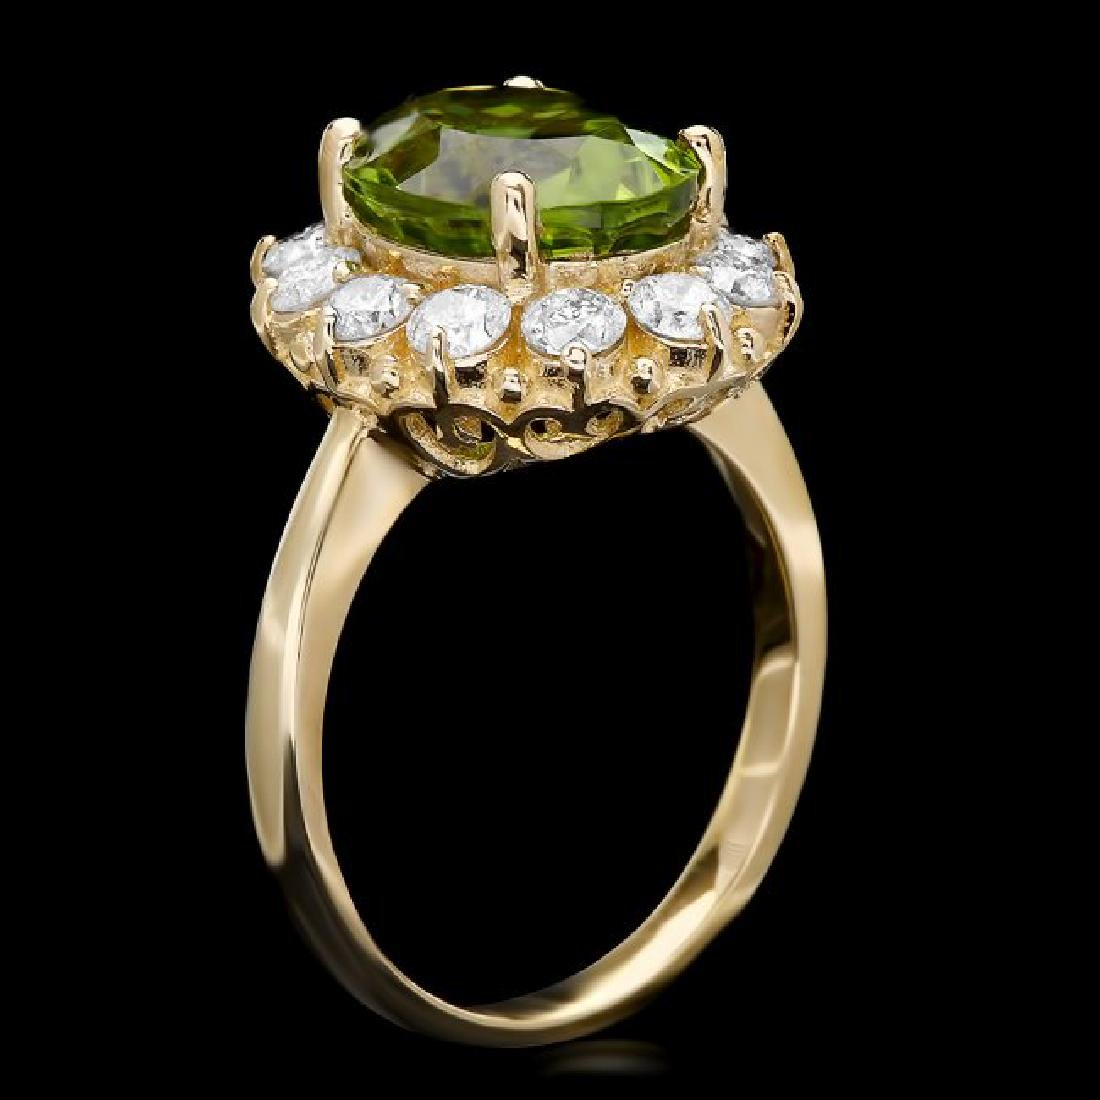 14k Gold 4.50ct Peridot 1.20ct Diamond Ring - 2